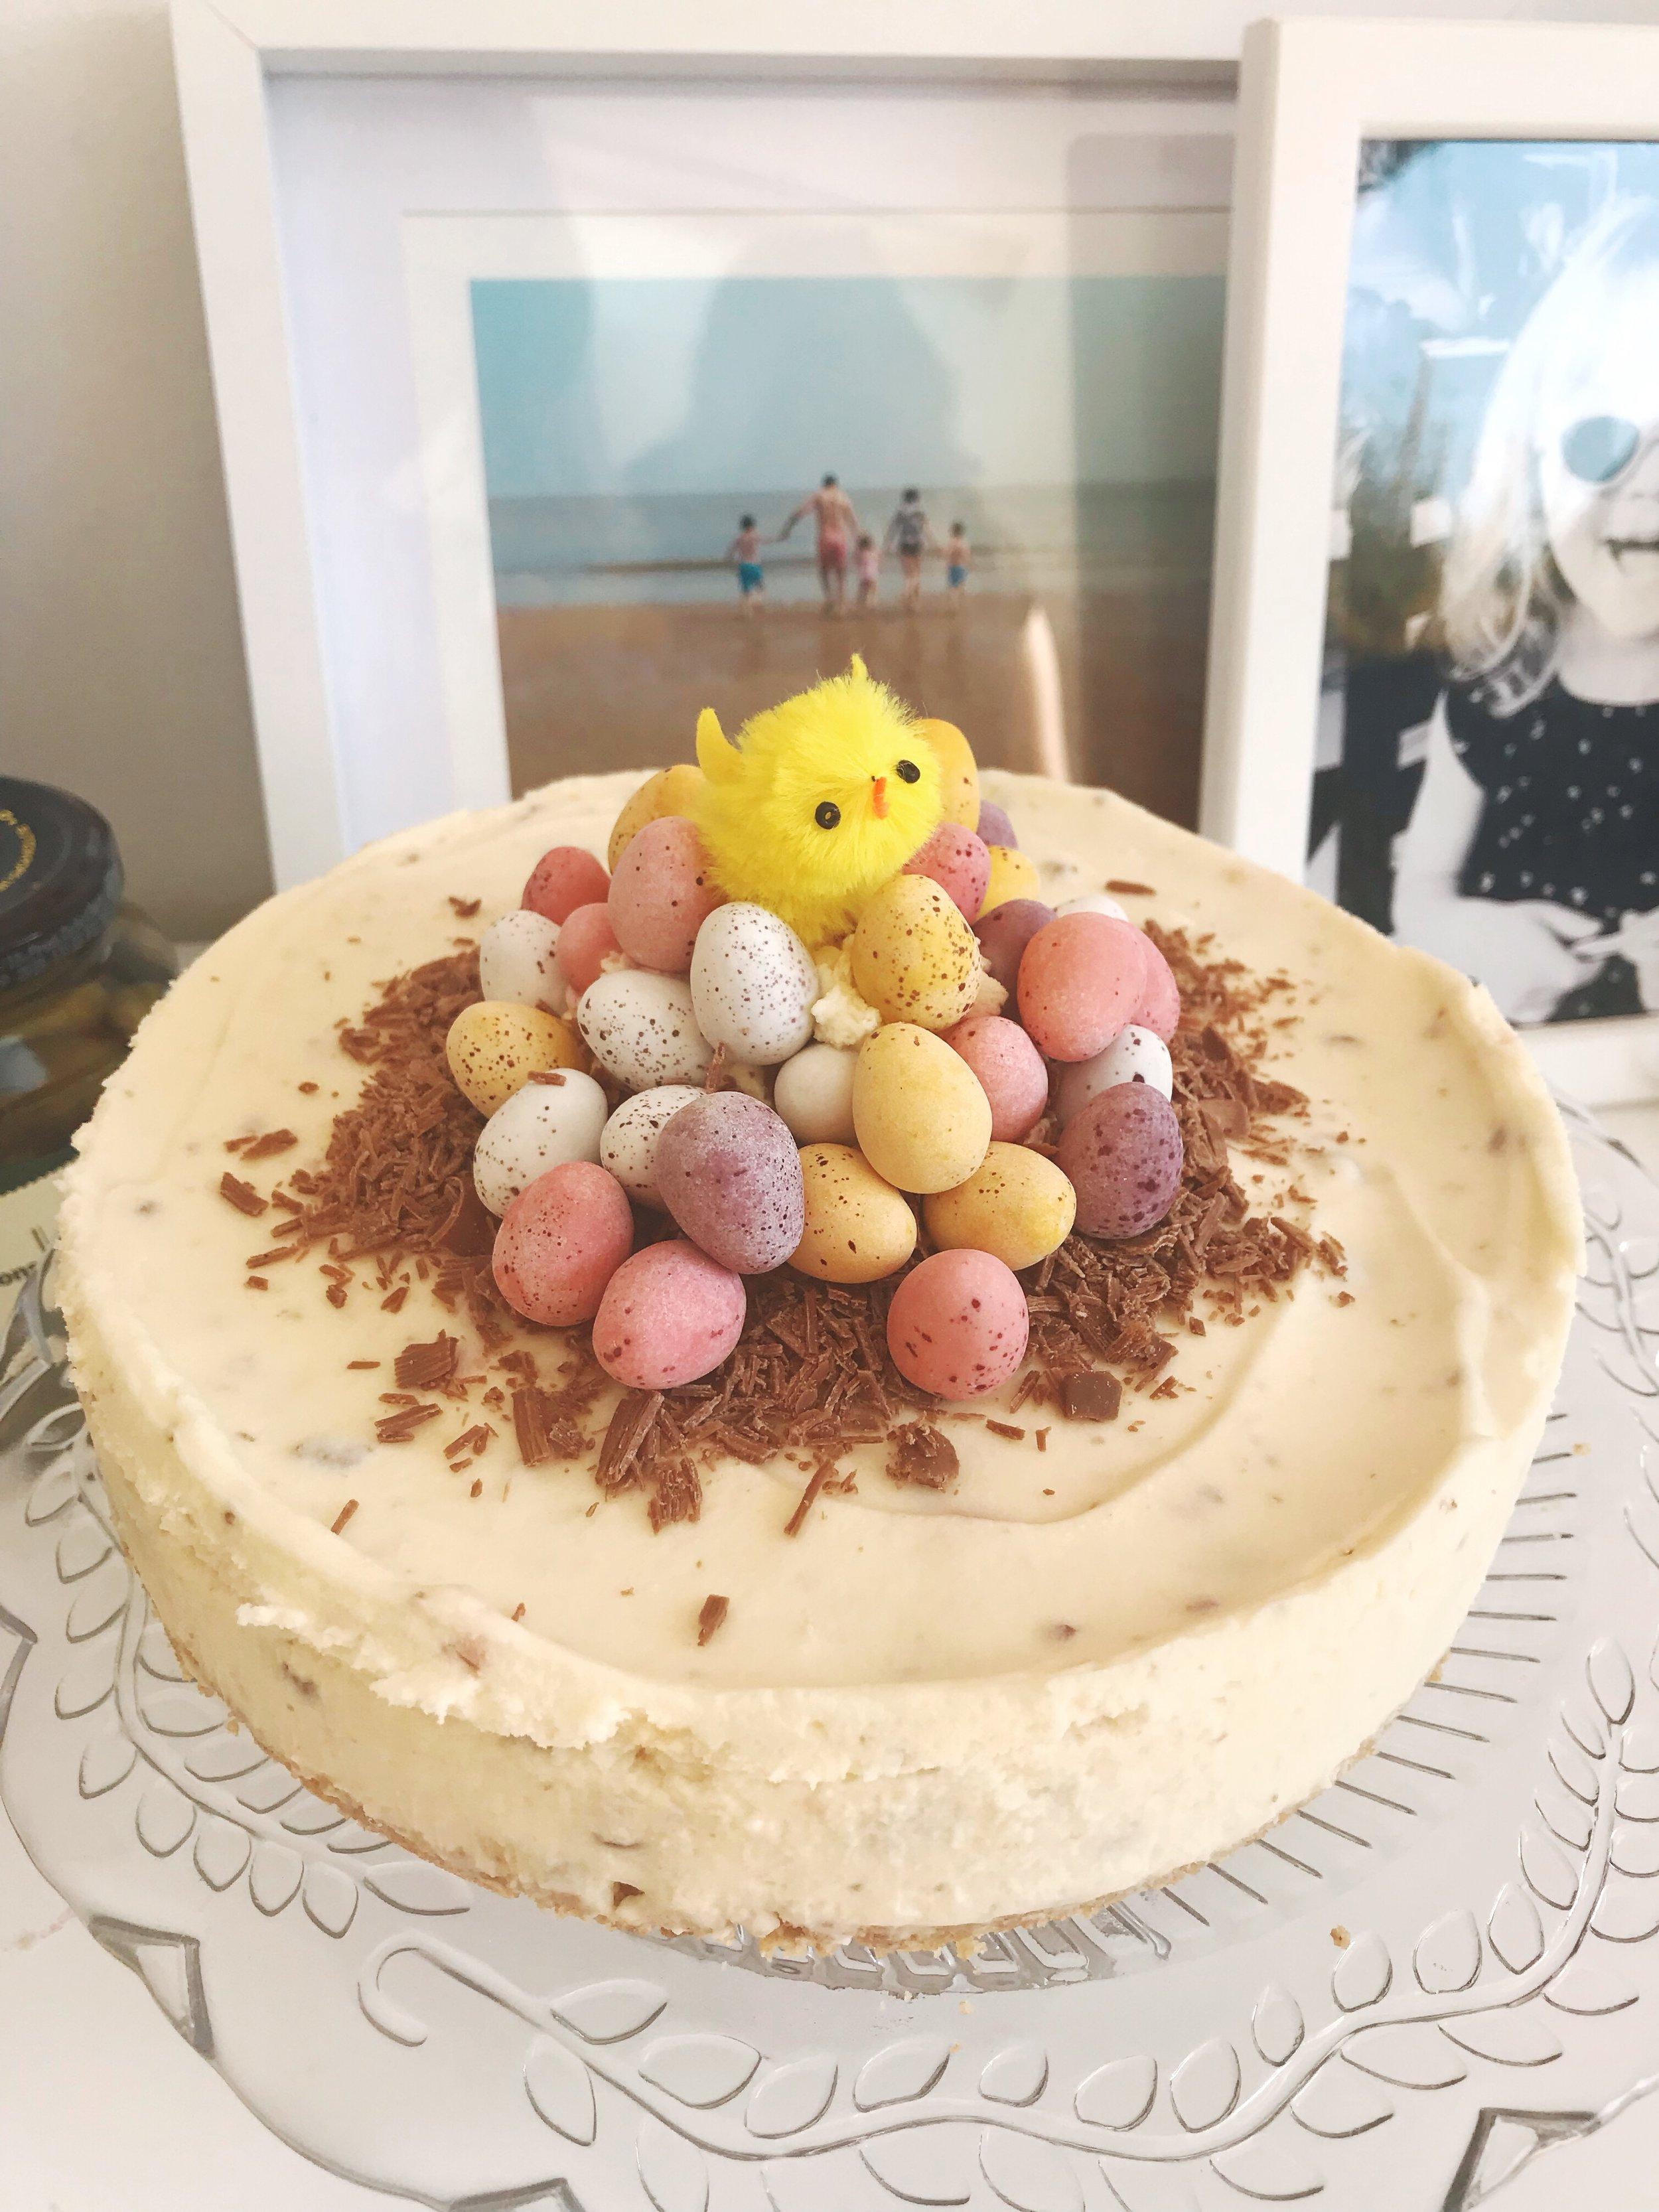 Vanilla Cadbury Mini Egg Cheesecake Recipe for Easter